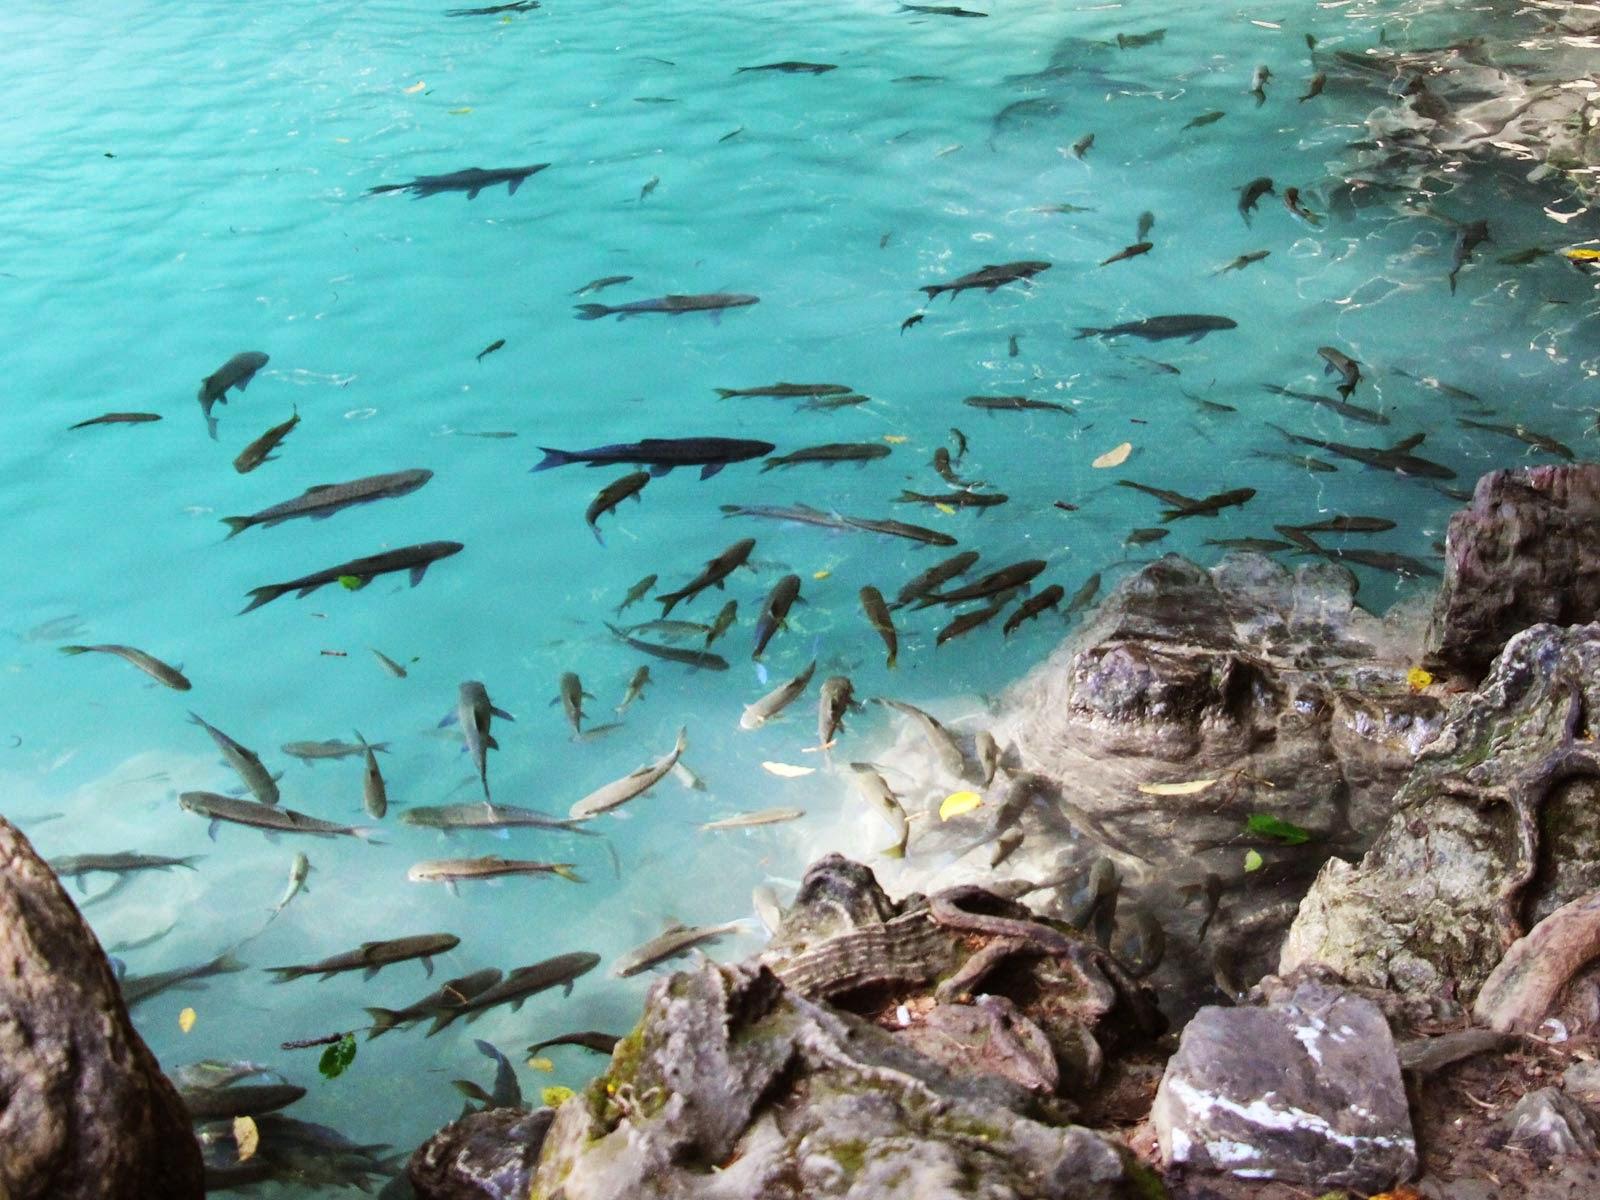 poissons cascades erwan